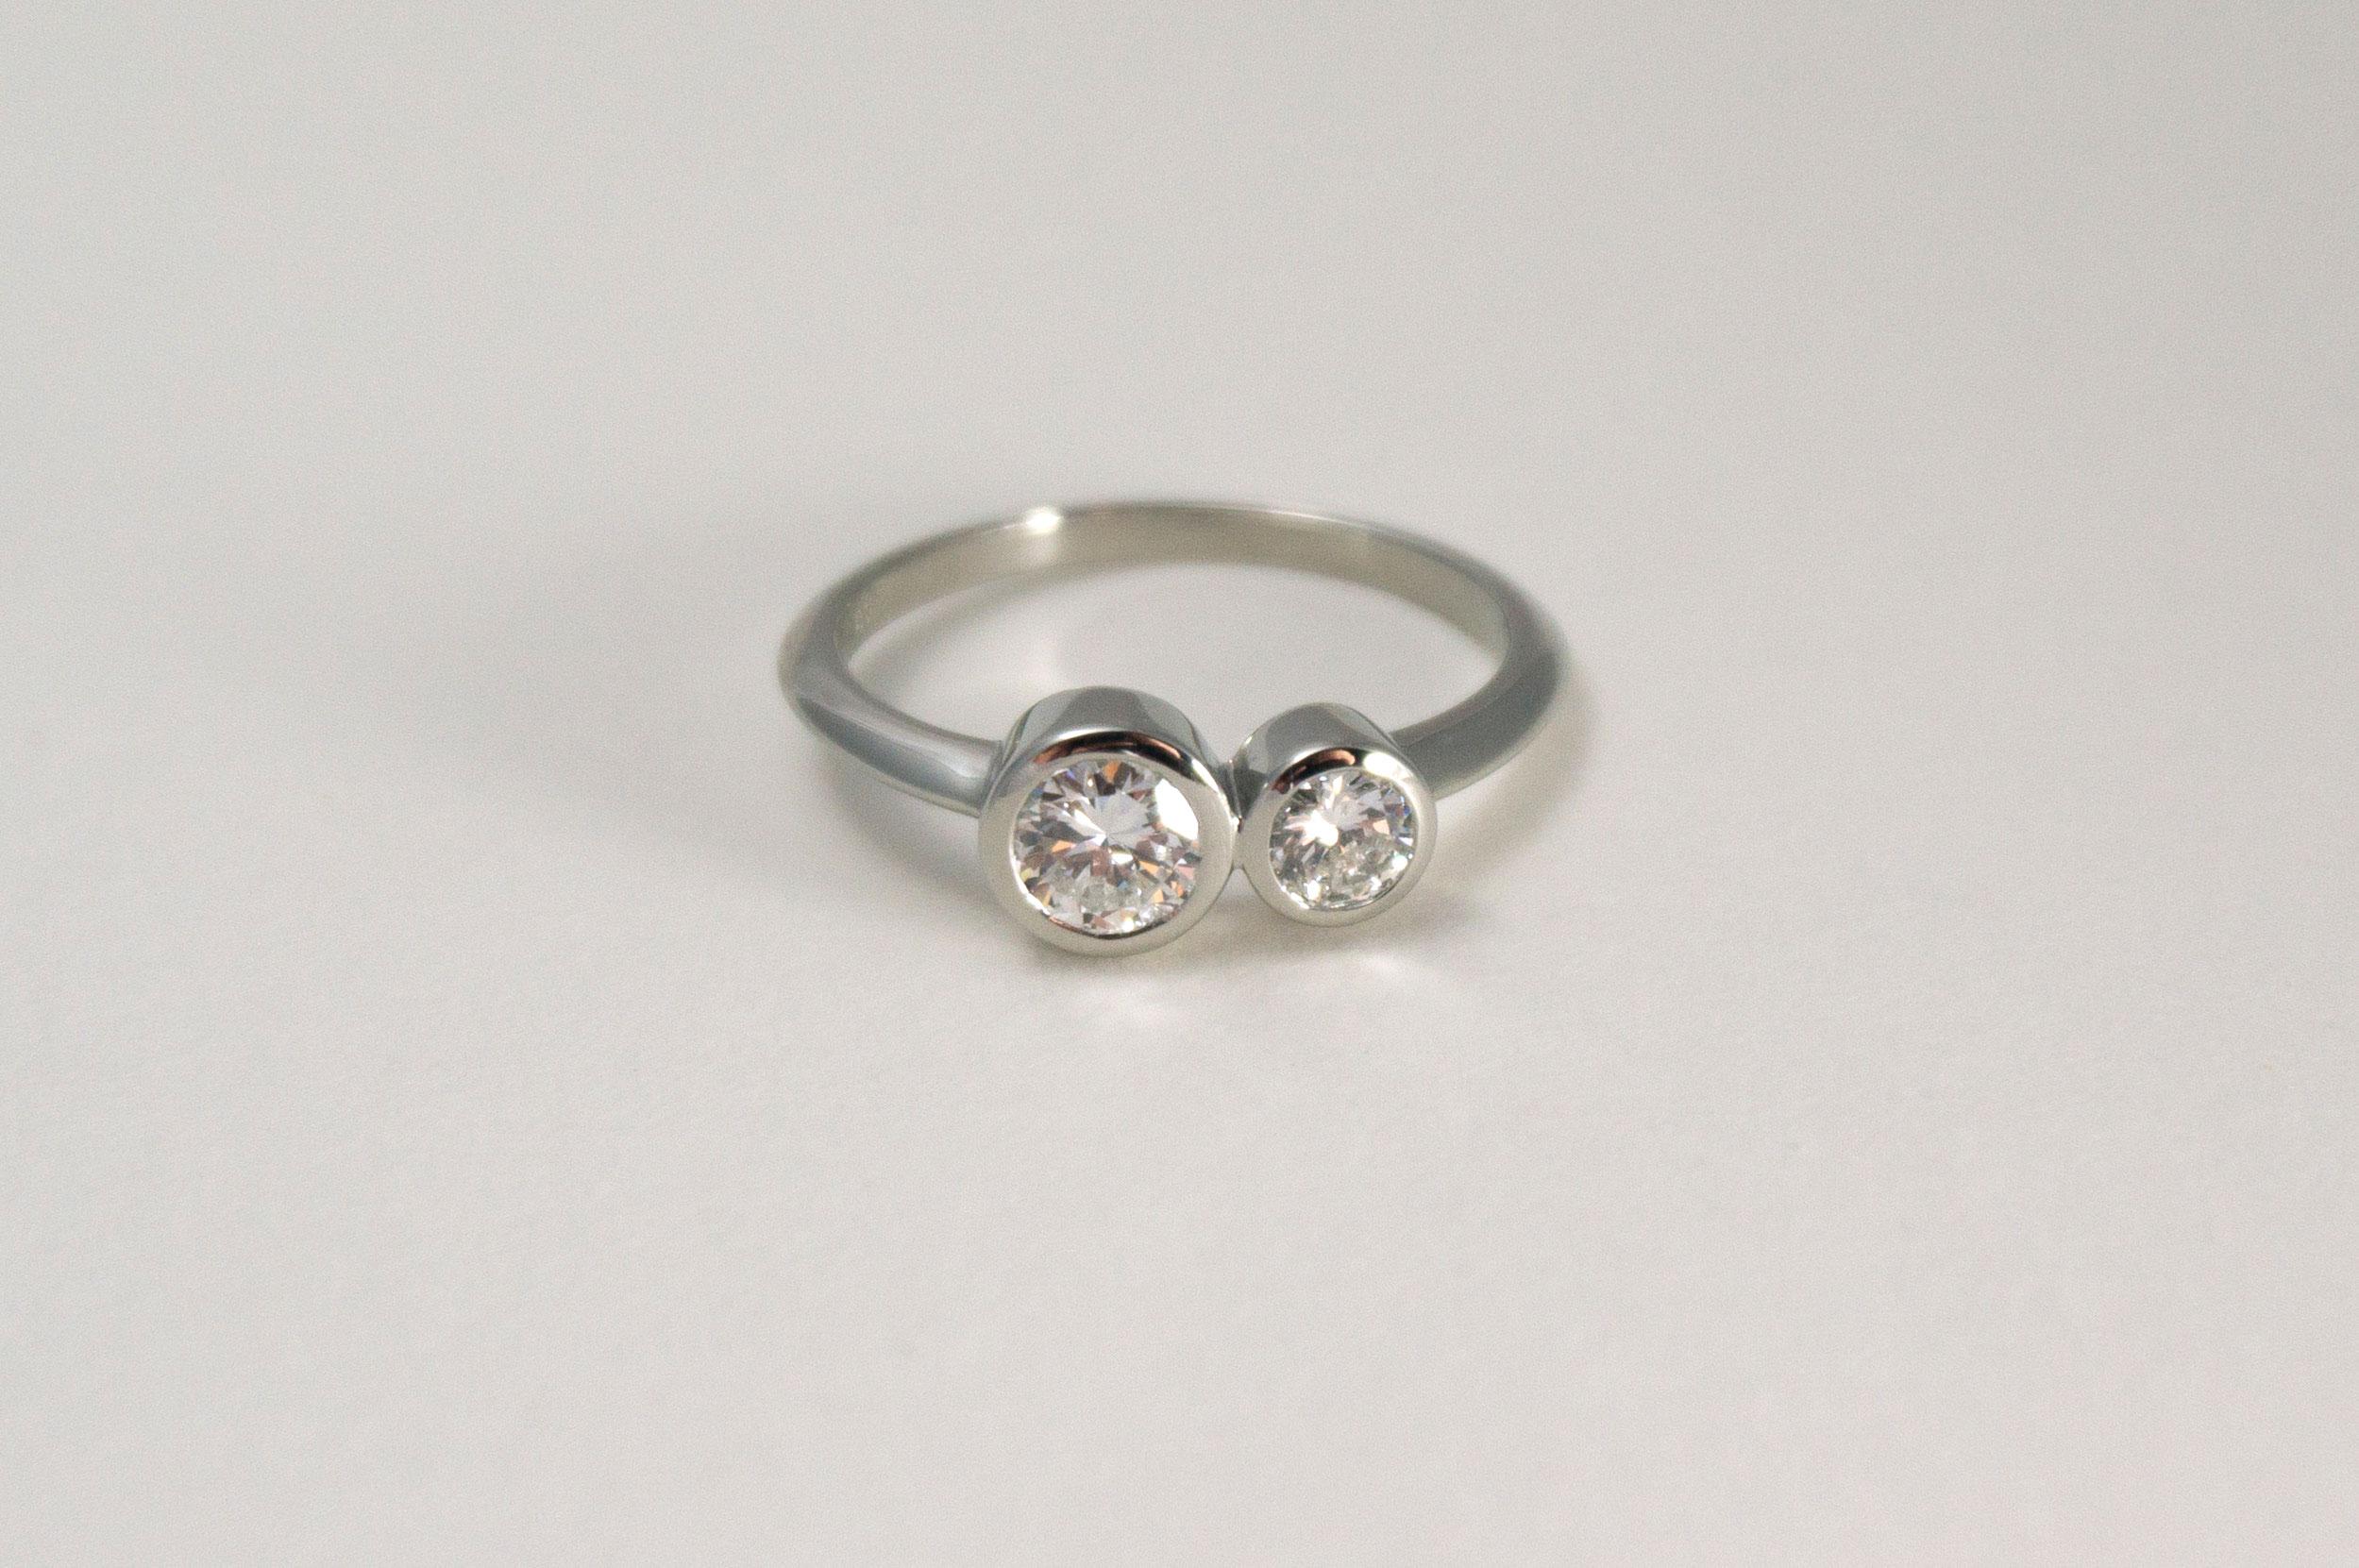 LORI Engagement Ring:  bezel set heirloom diamonds, knife edge band, 14k white gold.